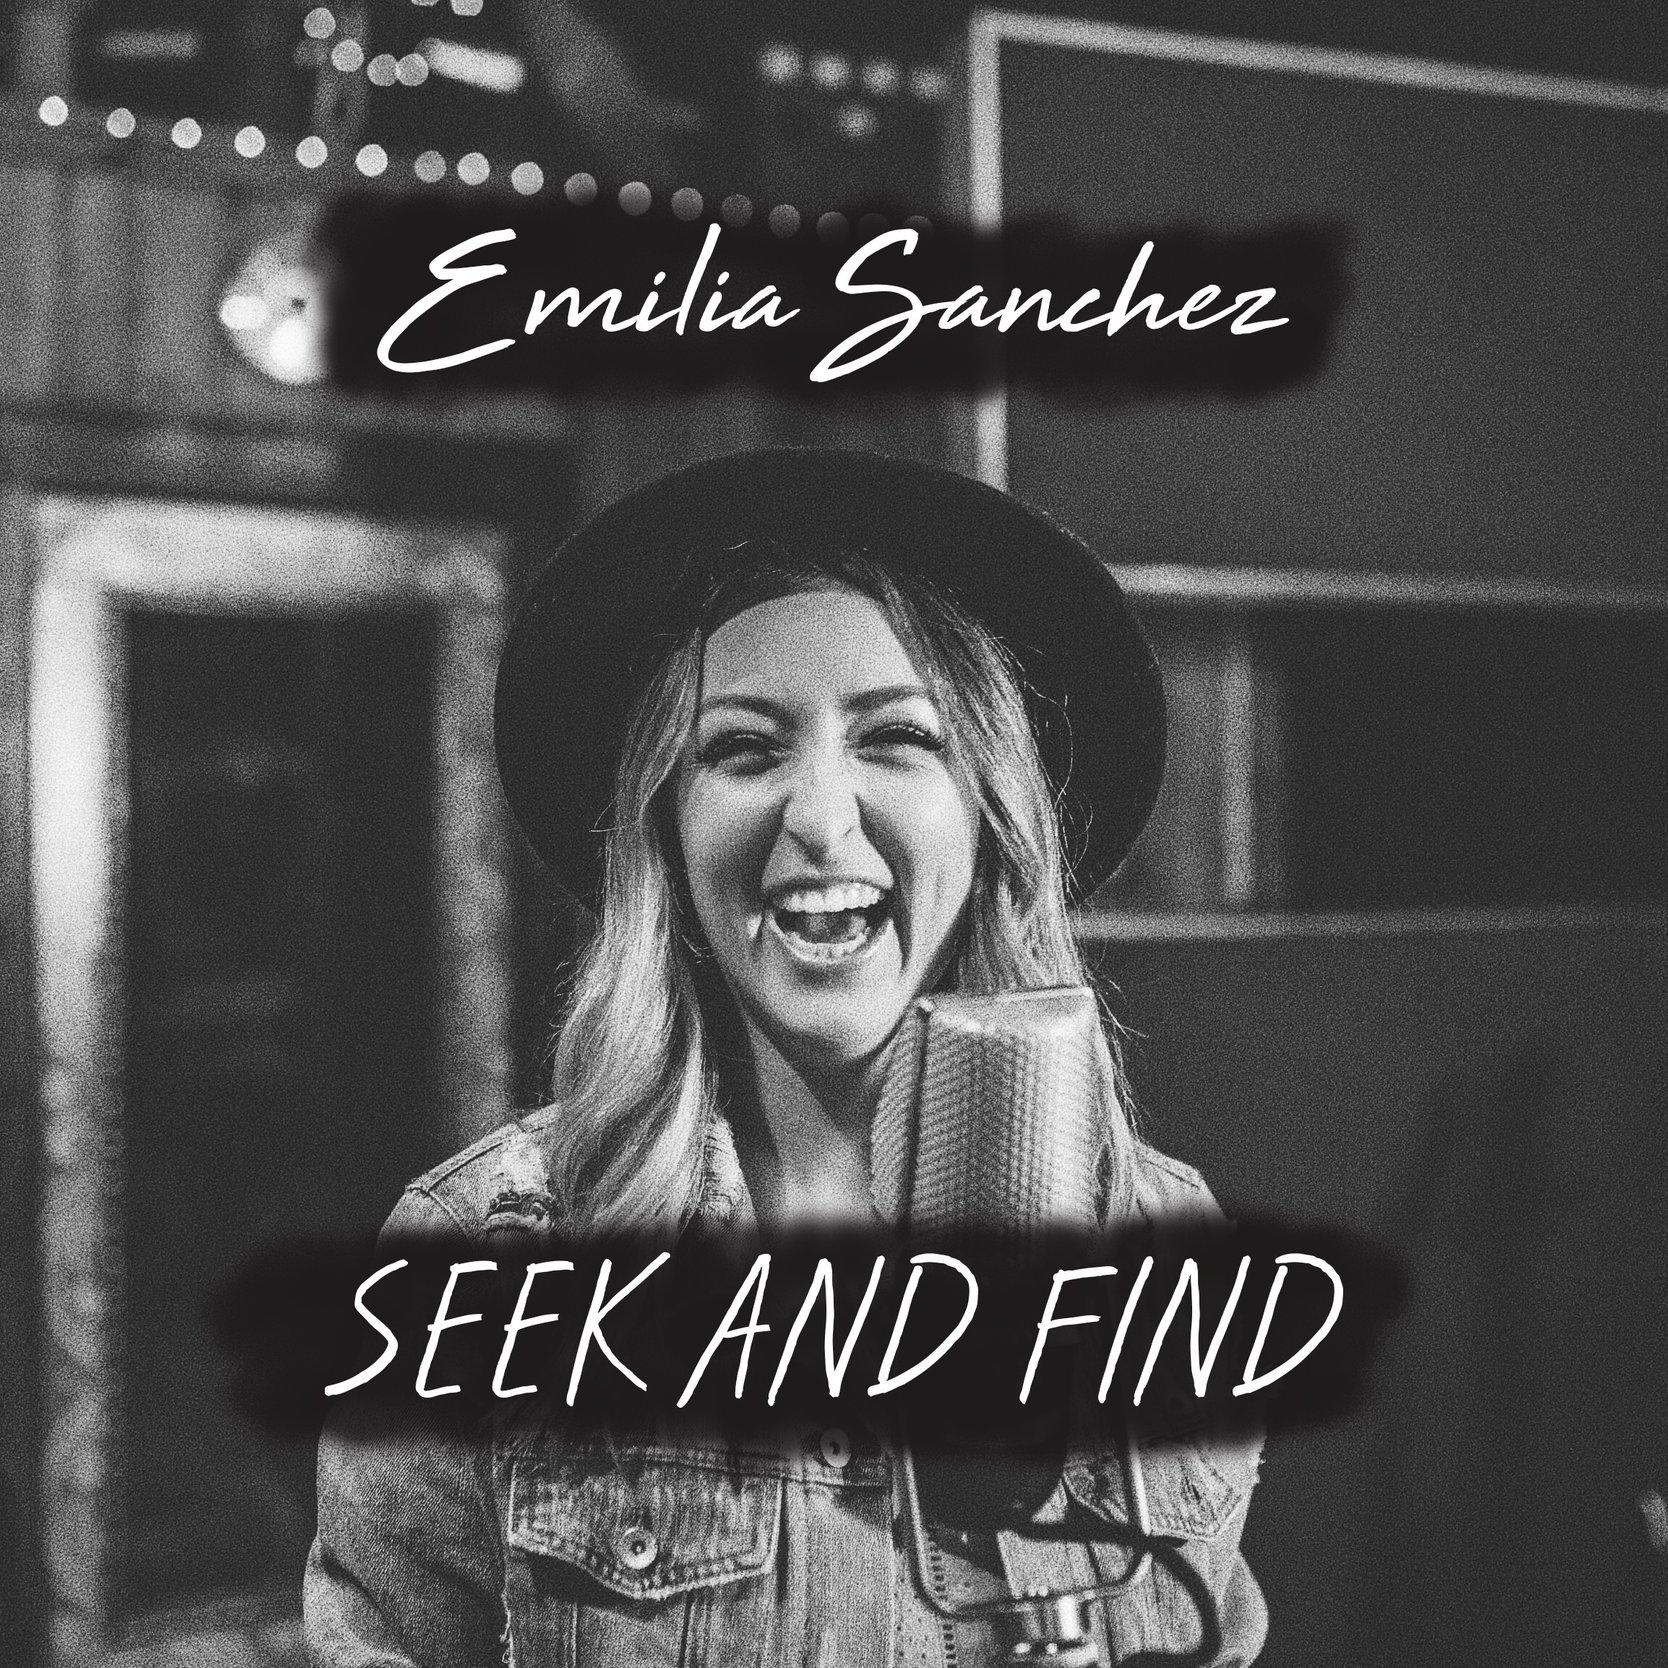 Emilia Sanchez: Seek and Find